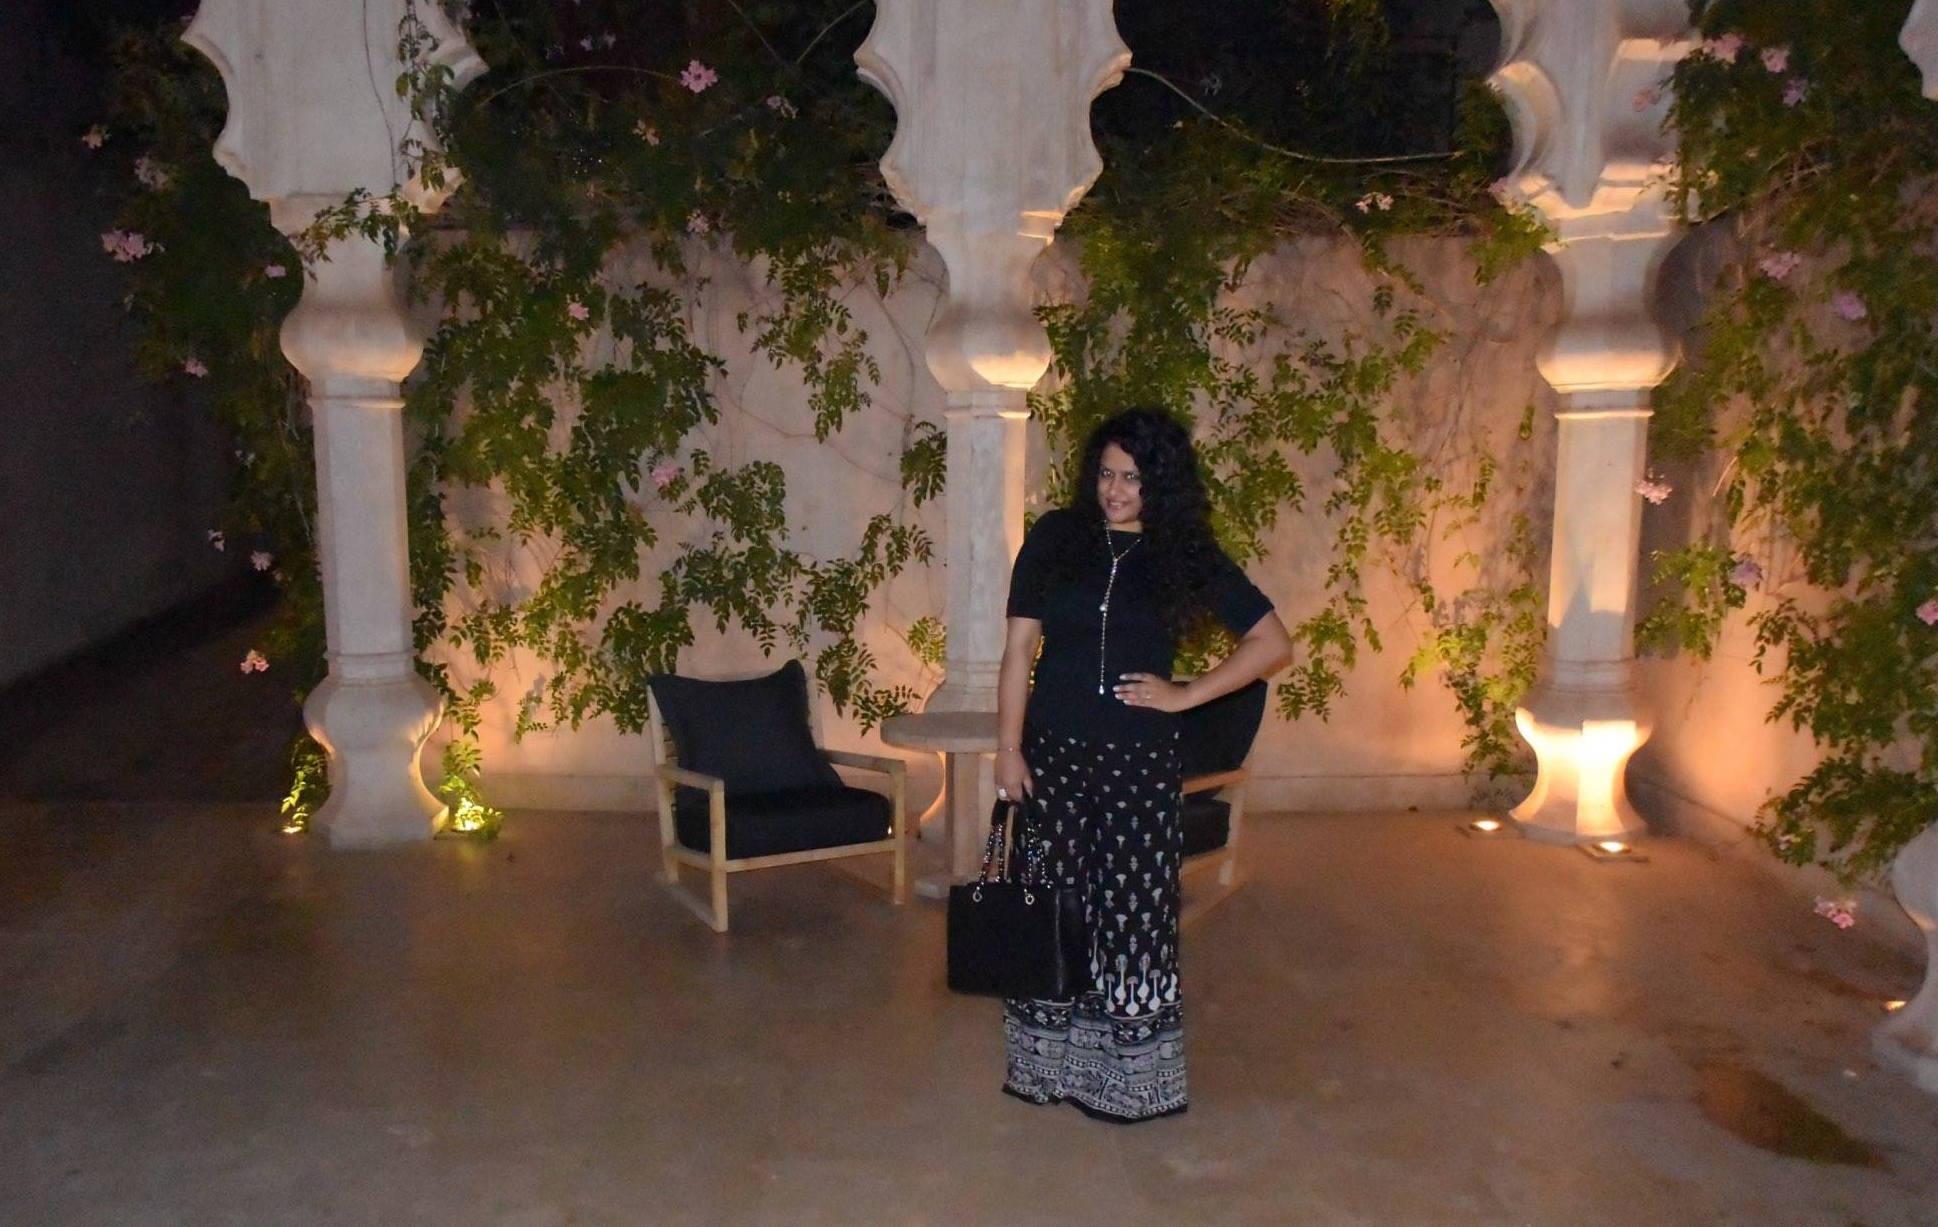 Pants: Tarun Tahiliani, Top: Ralph Lauren, Neckpiece & Ring: Isharya, Bag: Chanel